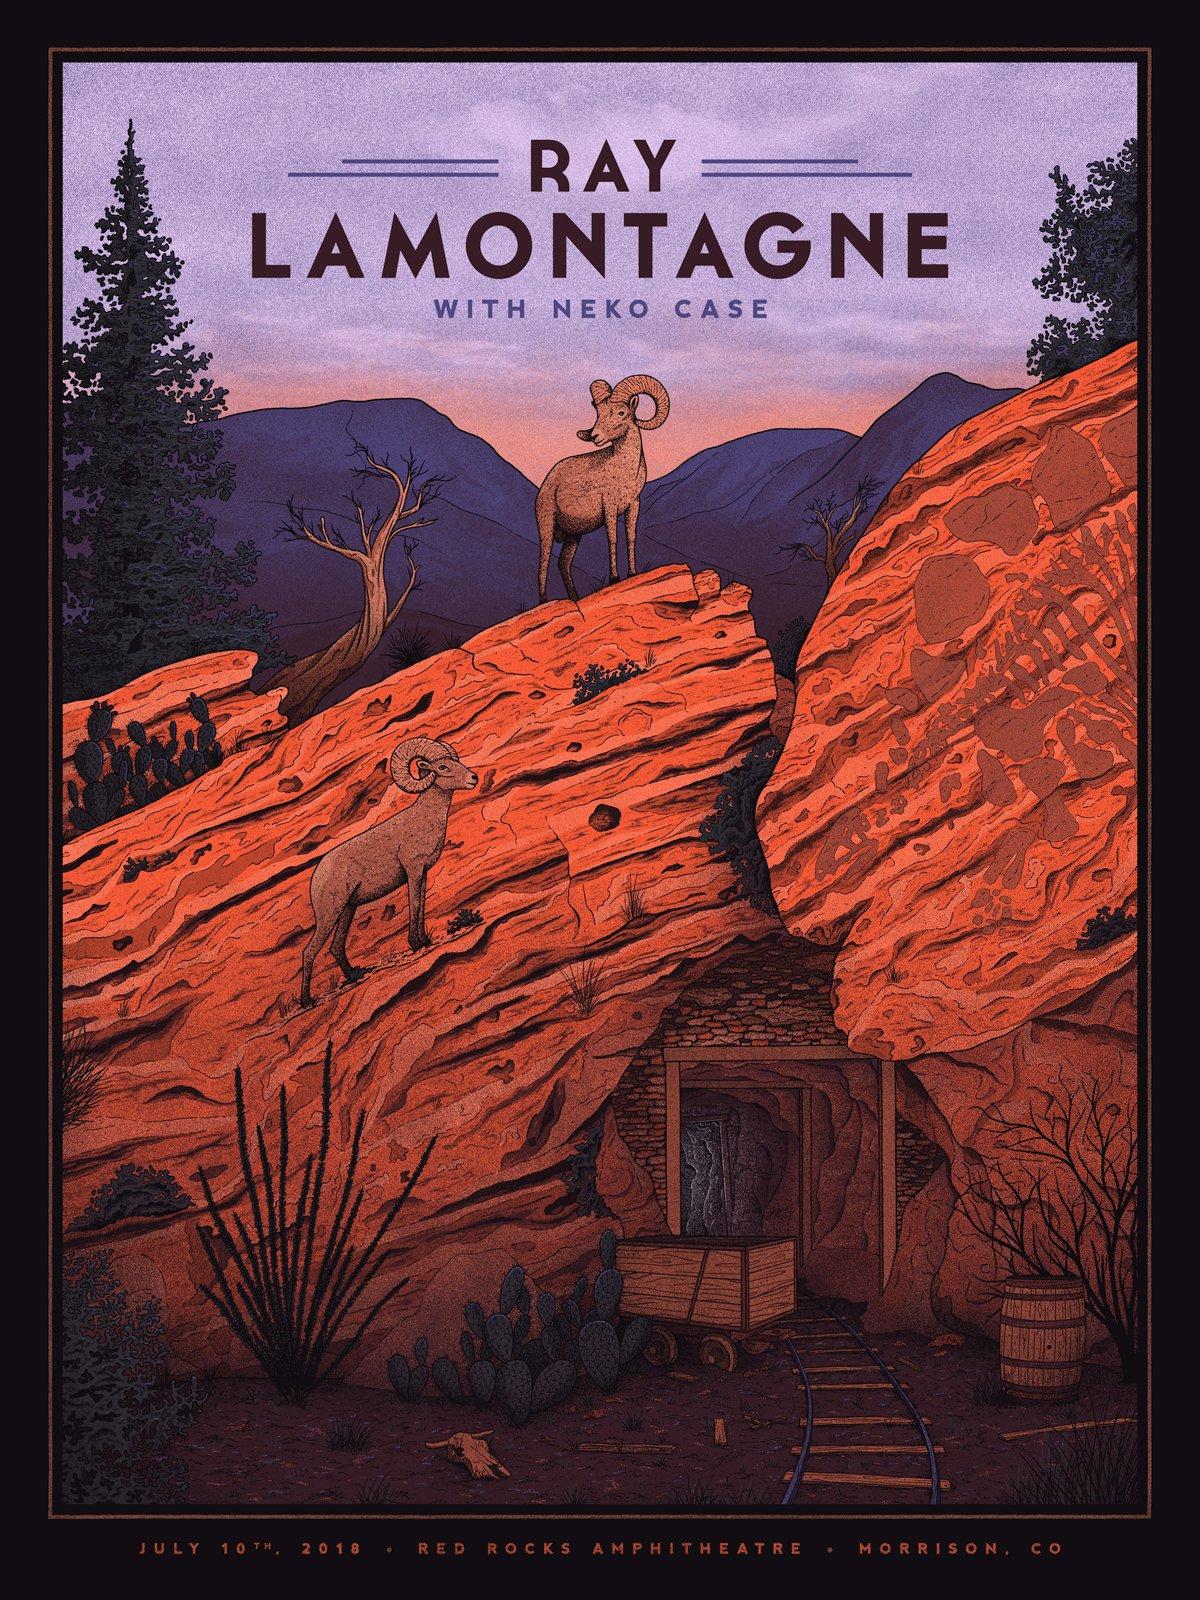 Nicholas-Moegly-Ray-LaMontagne-Red-Rocks-Poster_1024x1024@2x.jpg